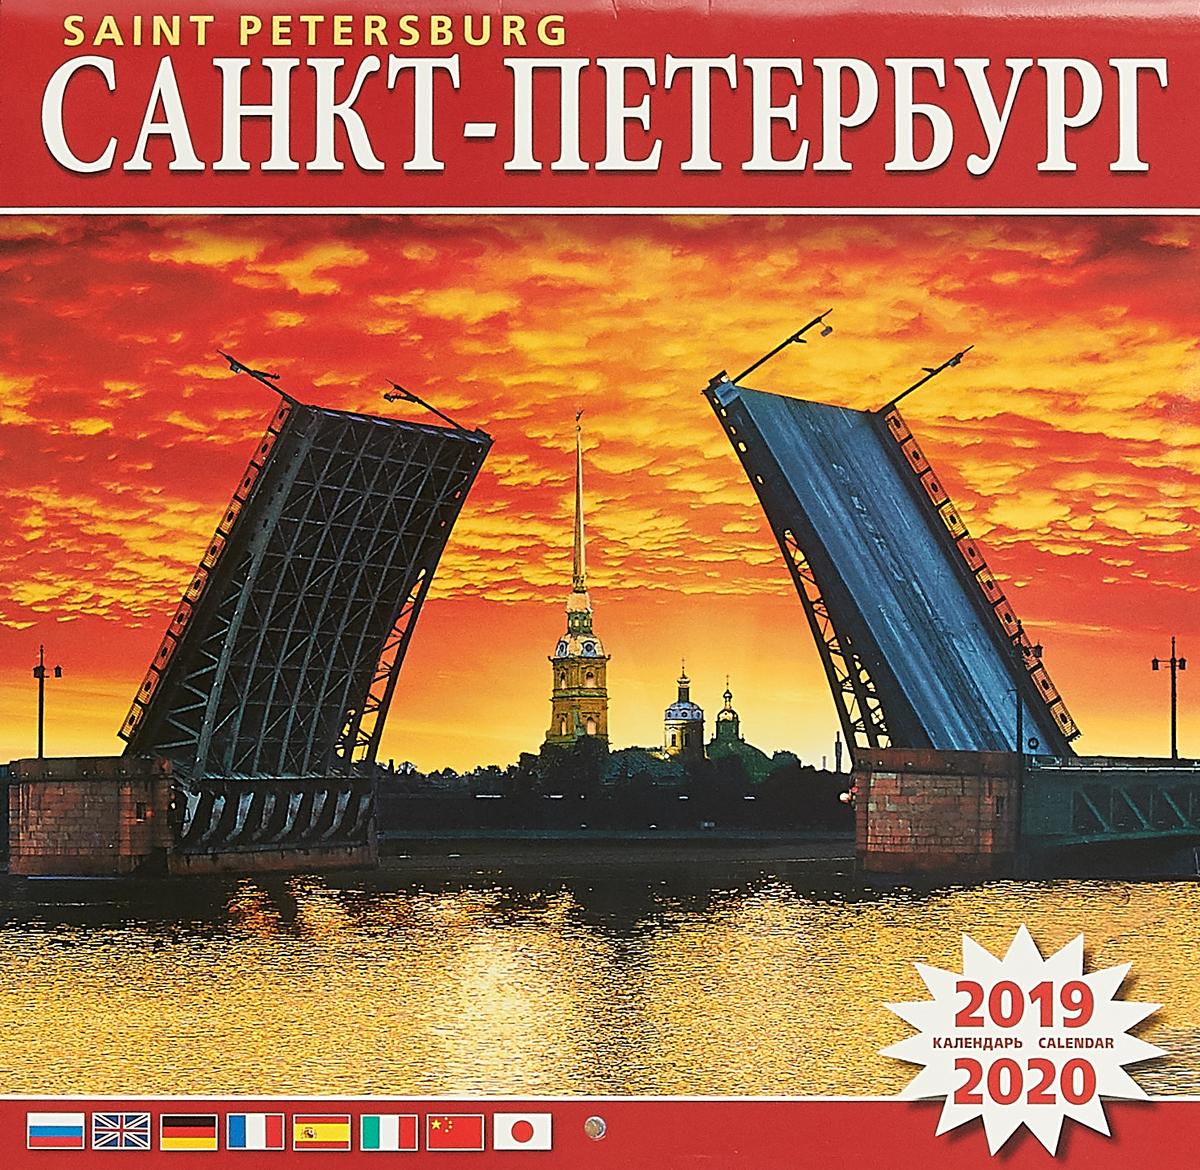 Календарь на скрепке на 2019-2020 год. Санкт-Петербург. Мост